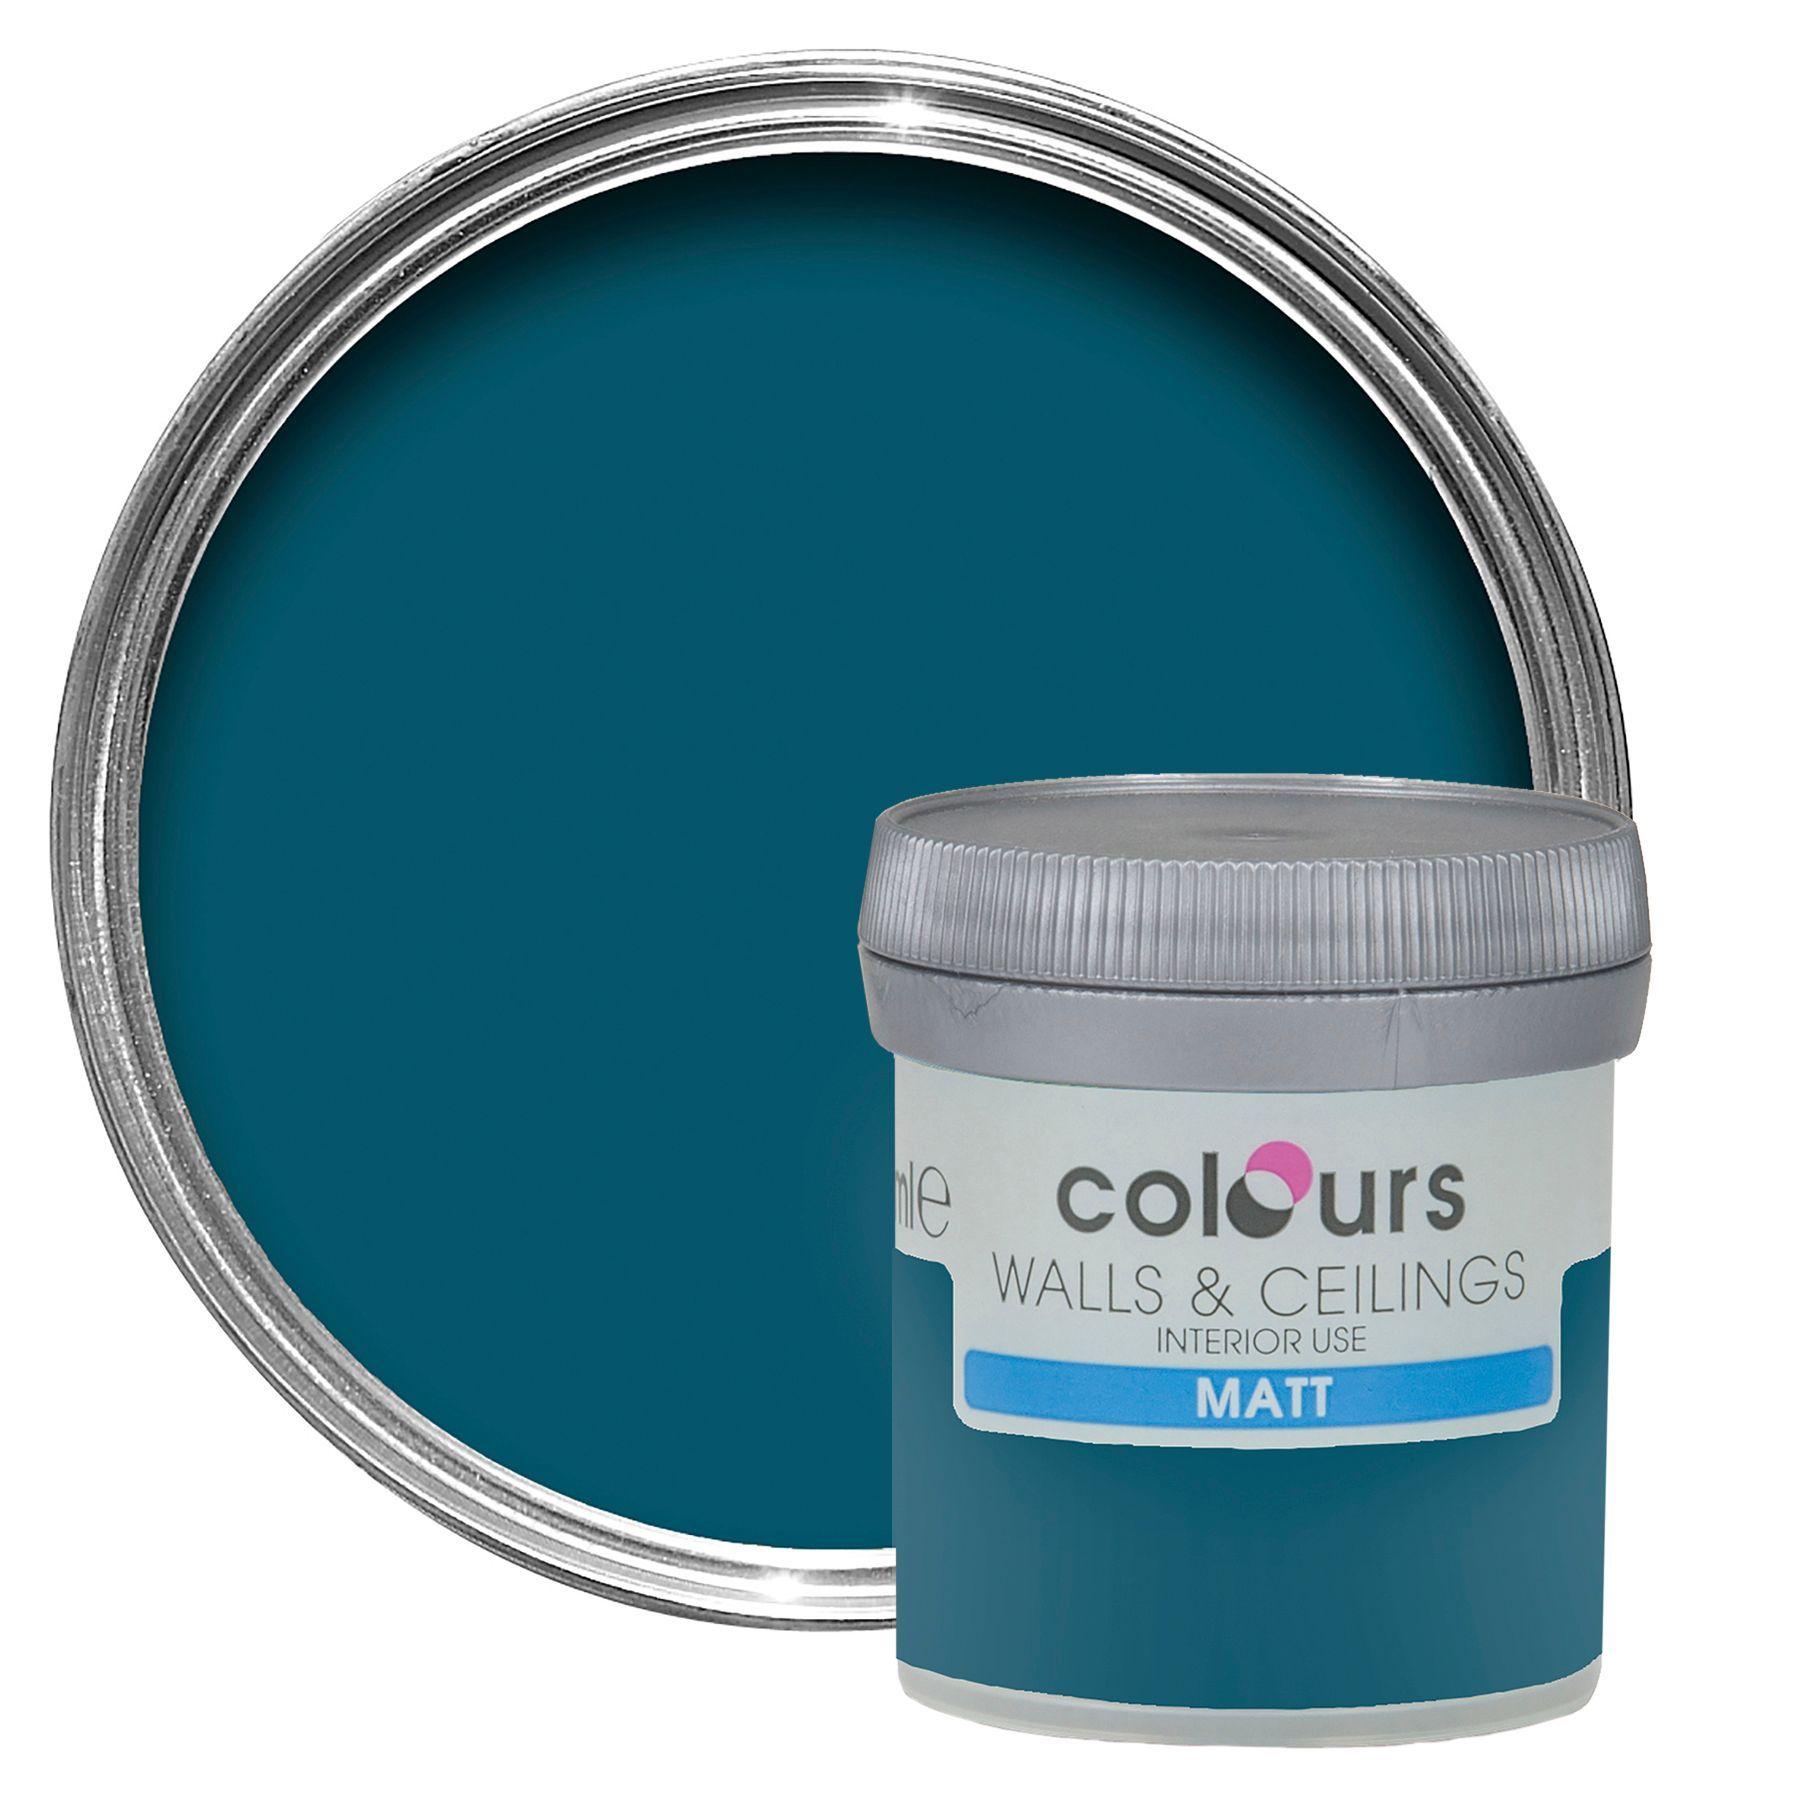 Colours Teal Temptation Matt Emulsion Paint 50ml Tester Pot Departments Diy At B Amp Q Painting Bathroom Bathroom Renovation Diy New Bathroom Ideas